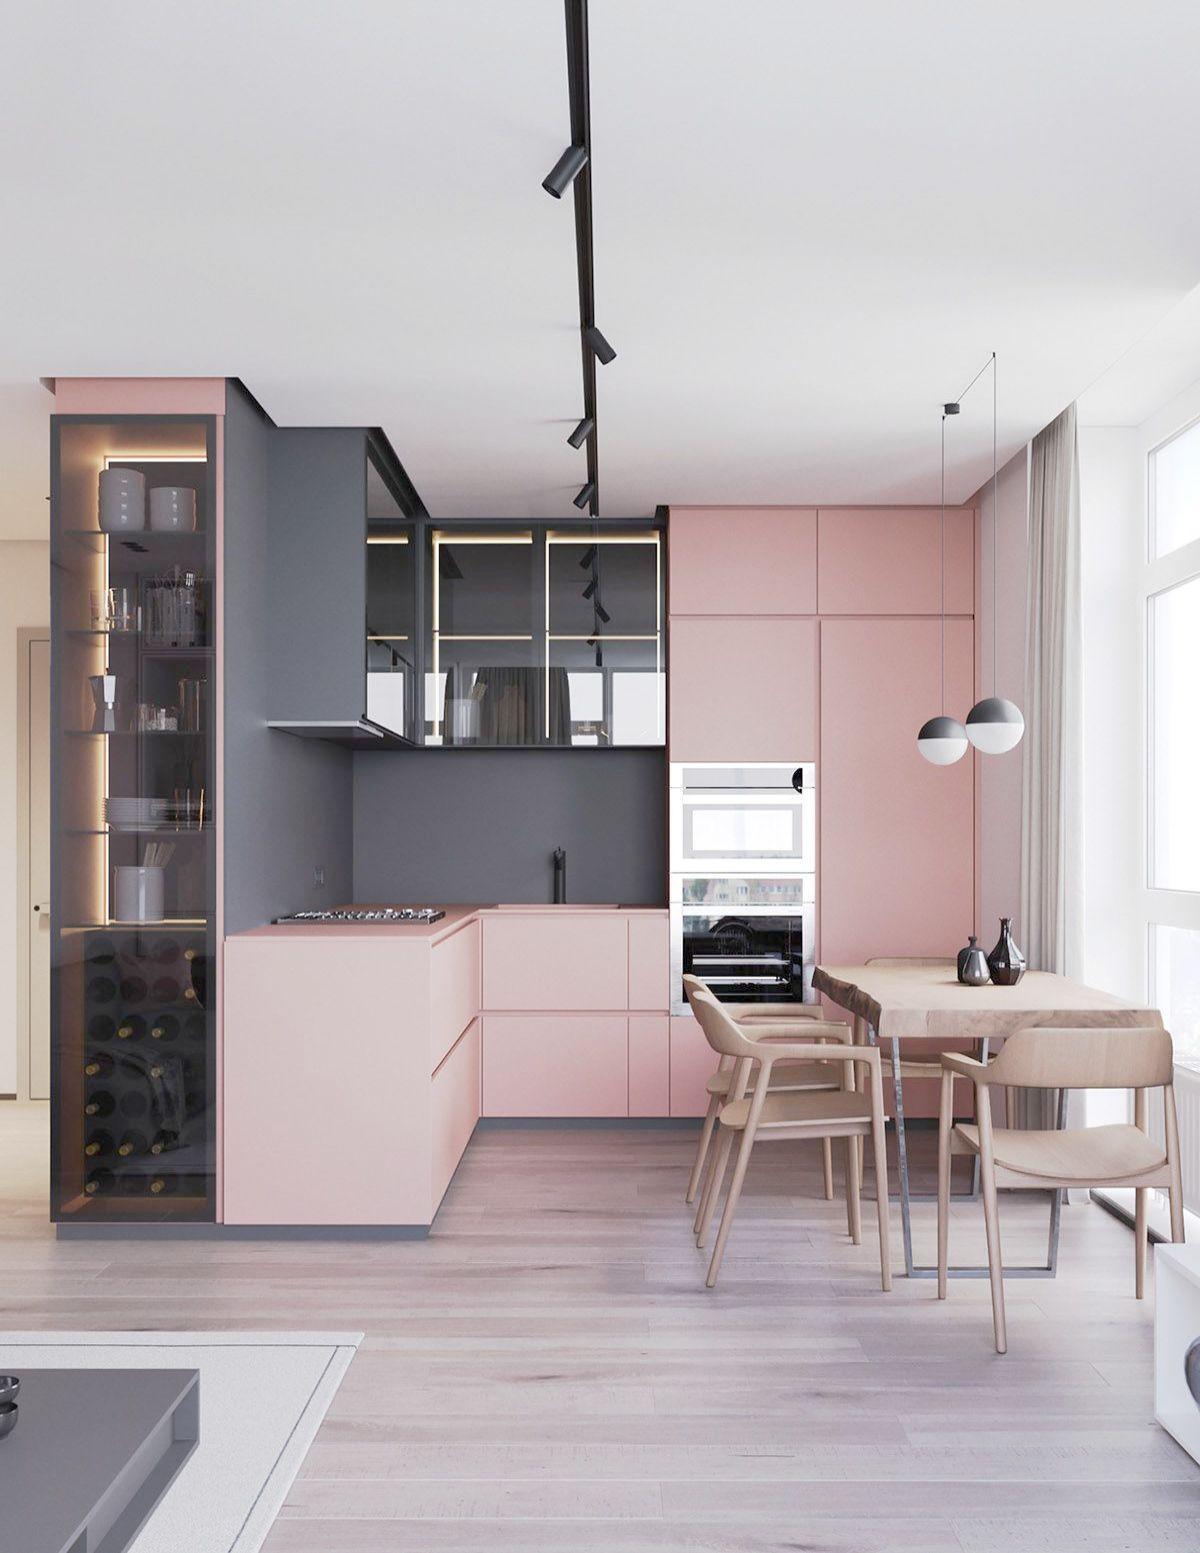 Interior Home Design Tool Home Interior Design App Kitchen Accessories Decor Kitchen Accessories Design New Kitchen Interior